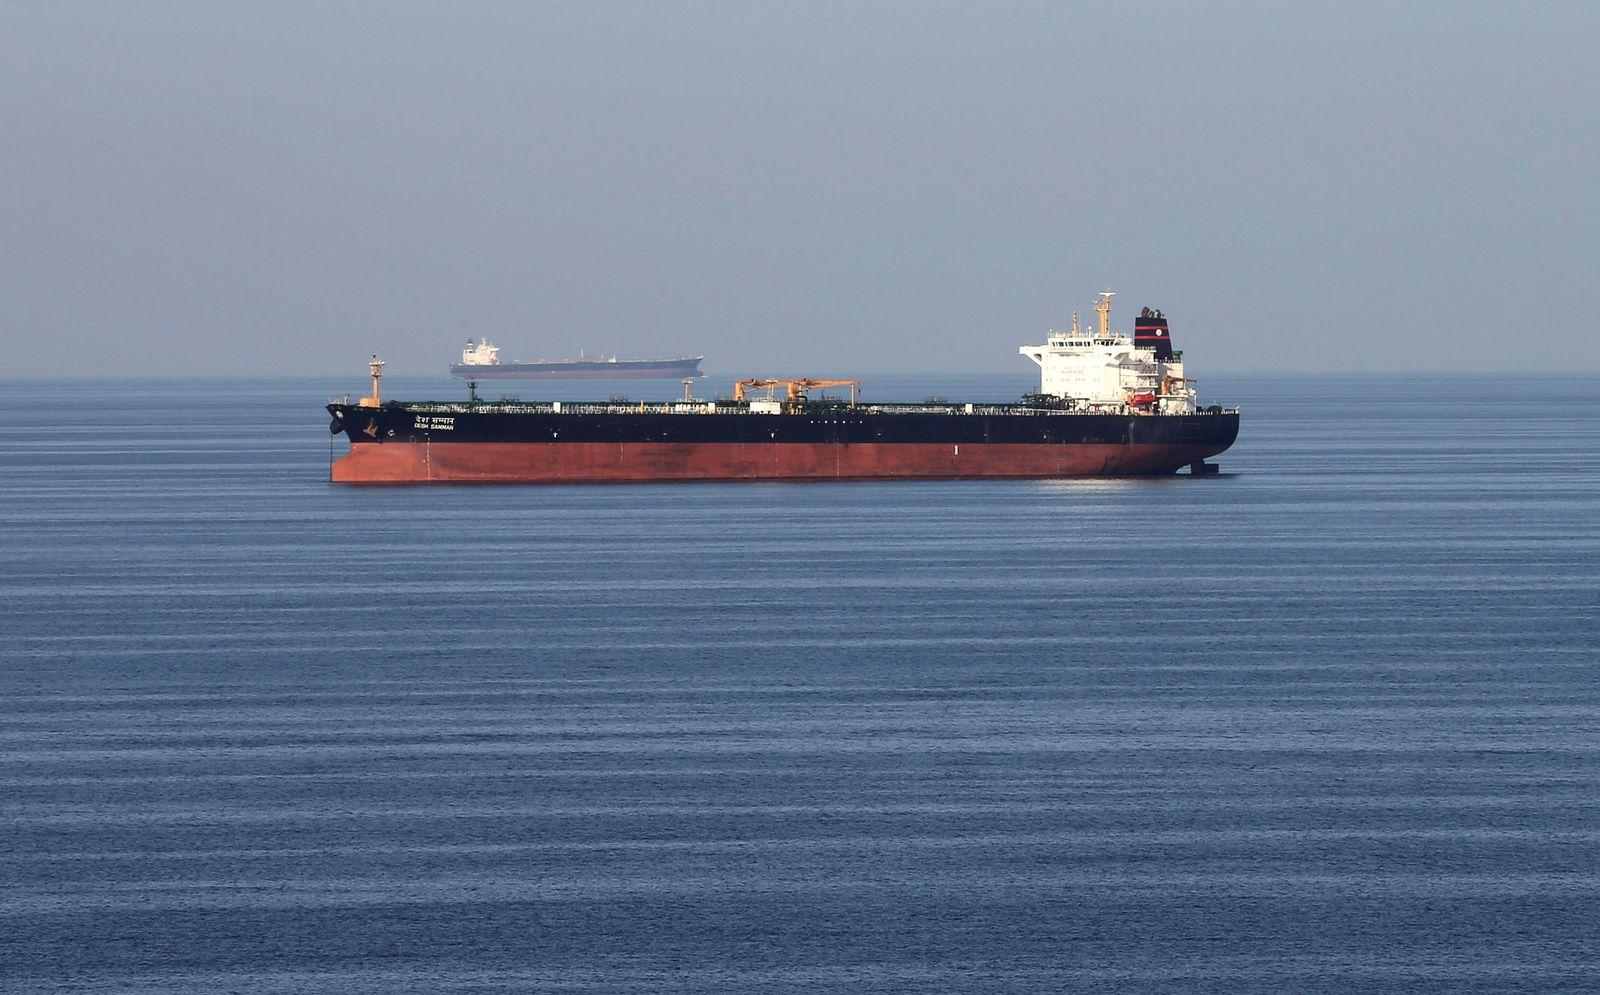 IRAQ-SECURITY/BRITAIN-SHIPS